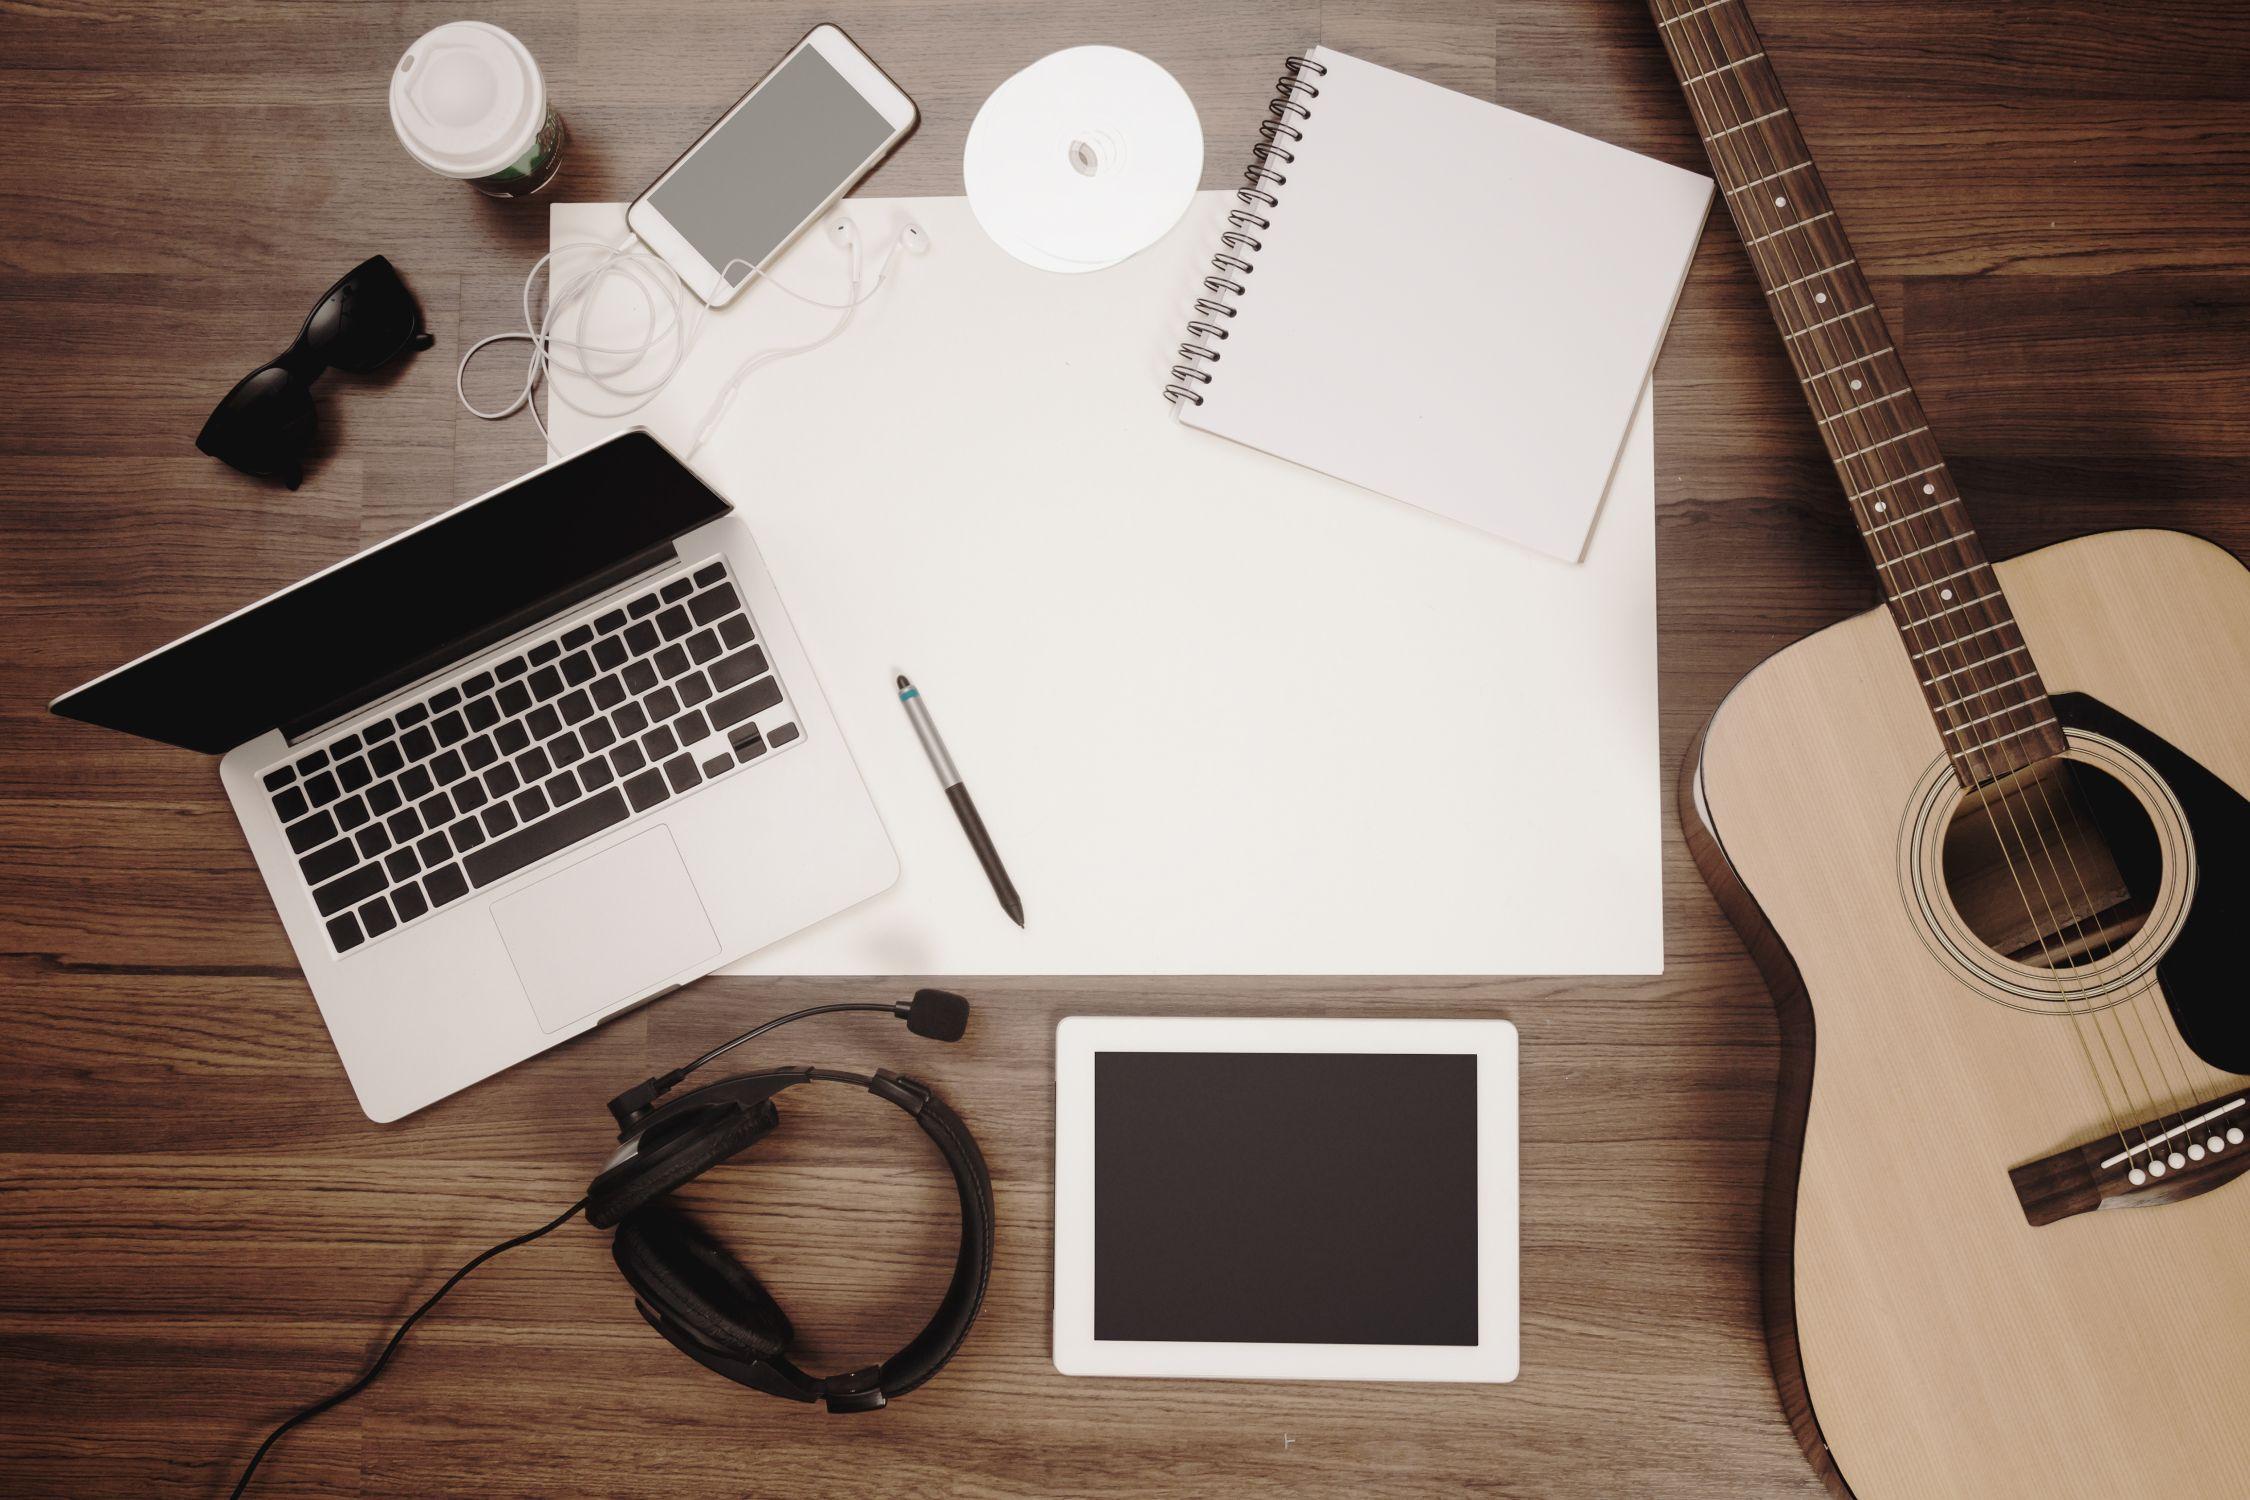 Musical Instruments - Supplies & Accessories